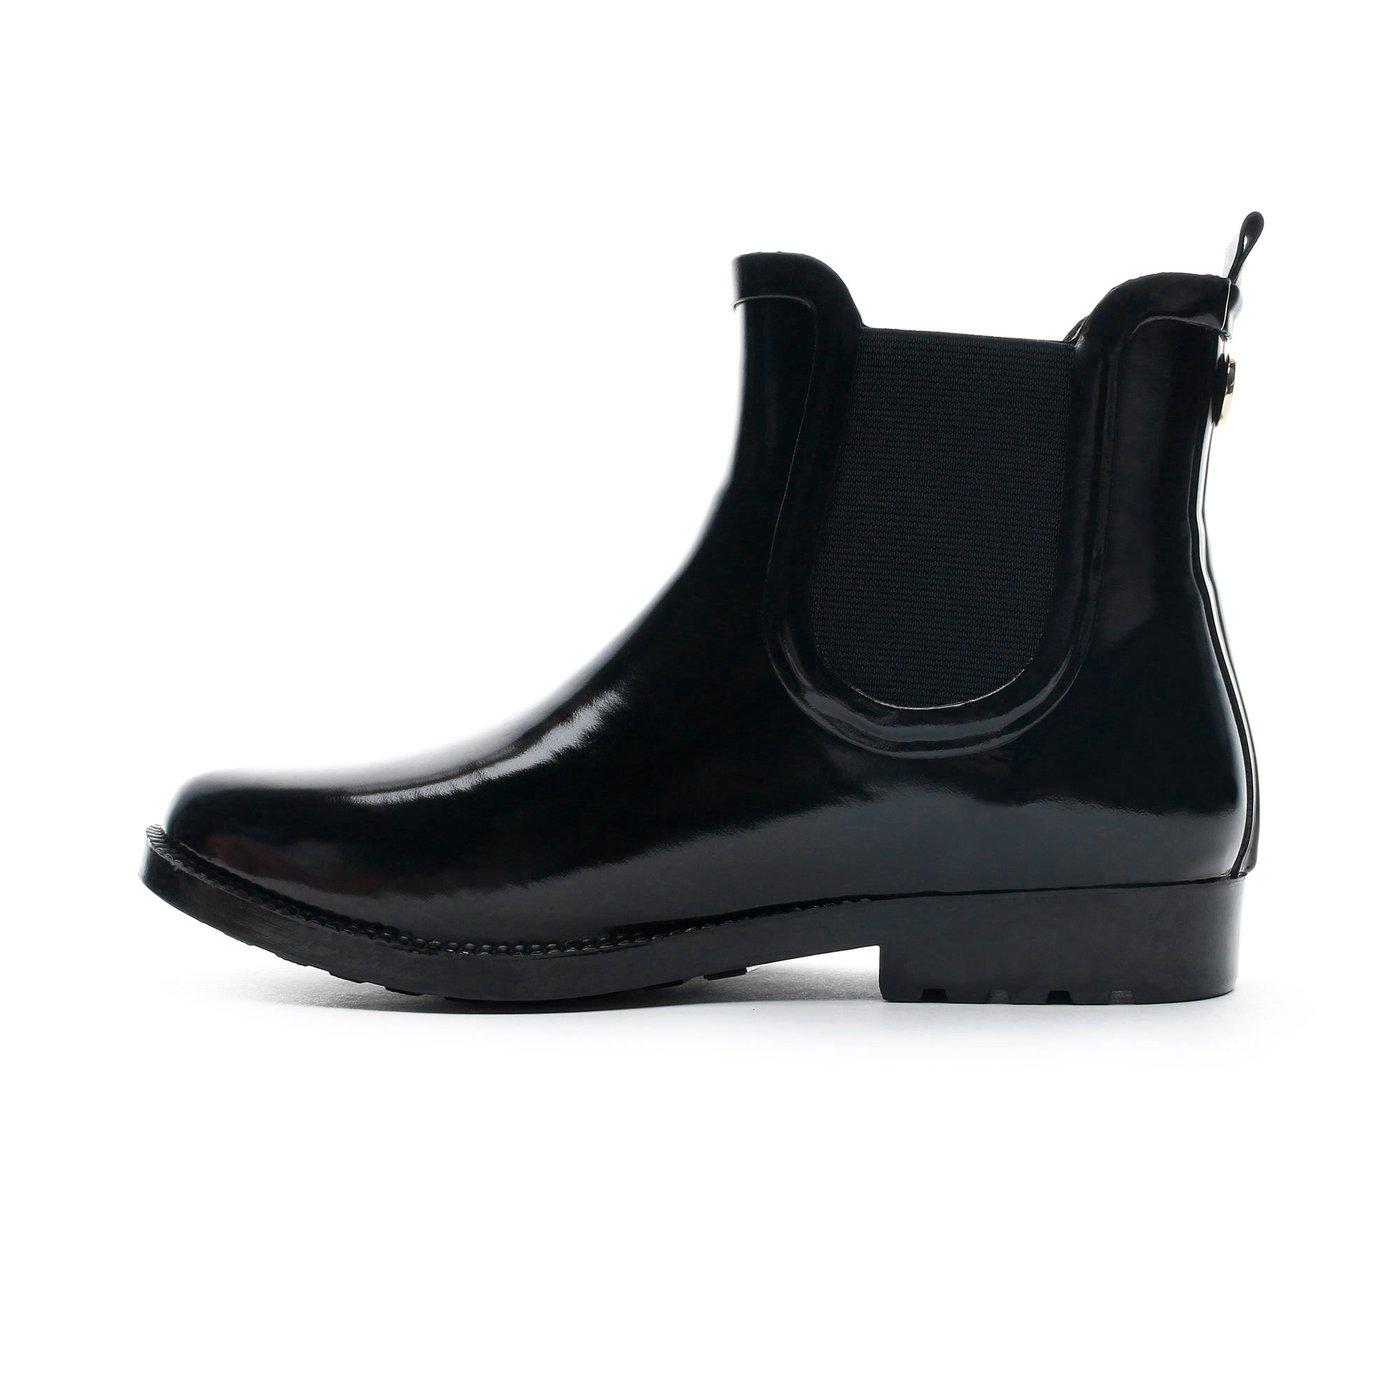 Guess Rekha3 Siyah Kadın Yağmur Botu